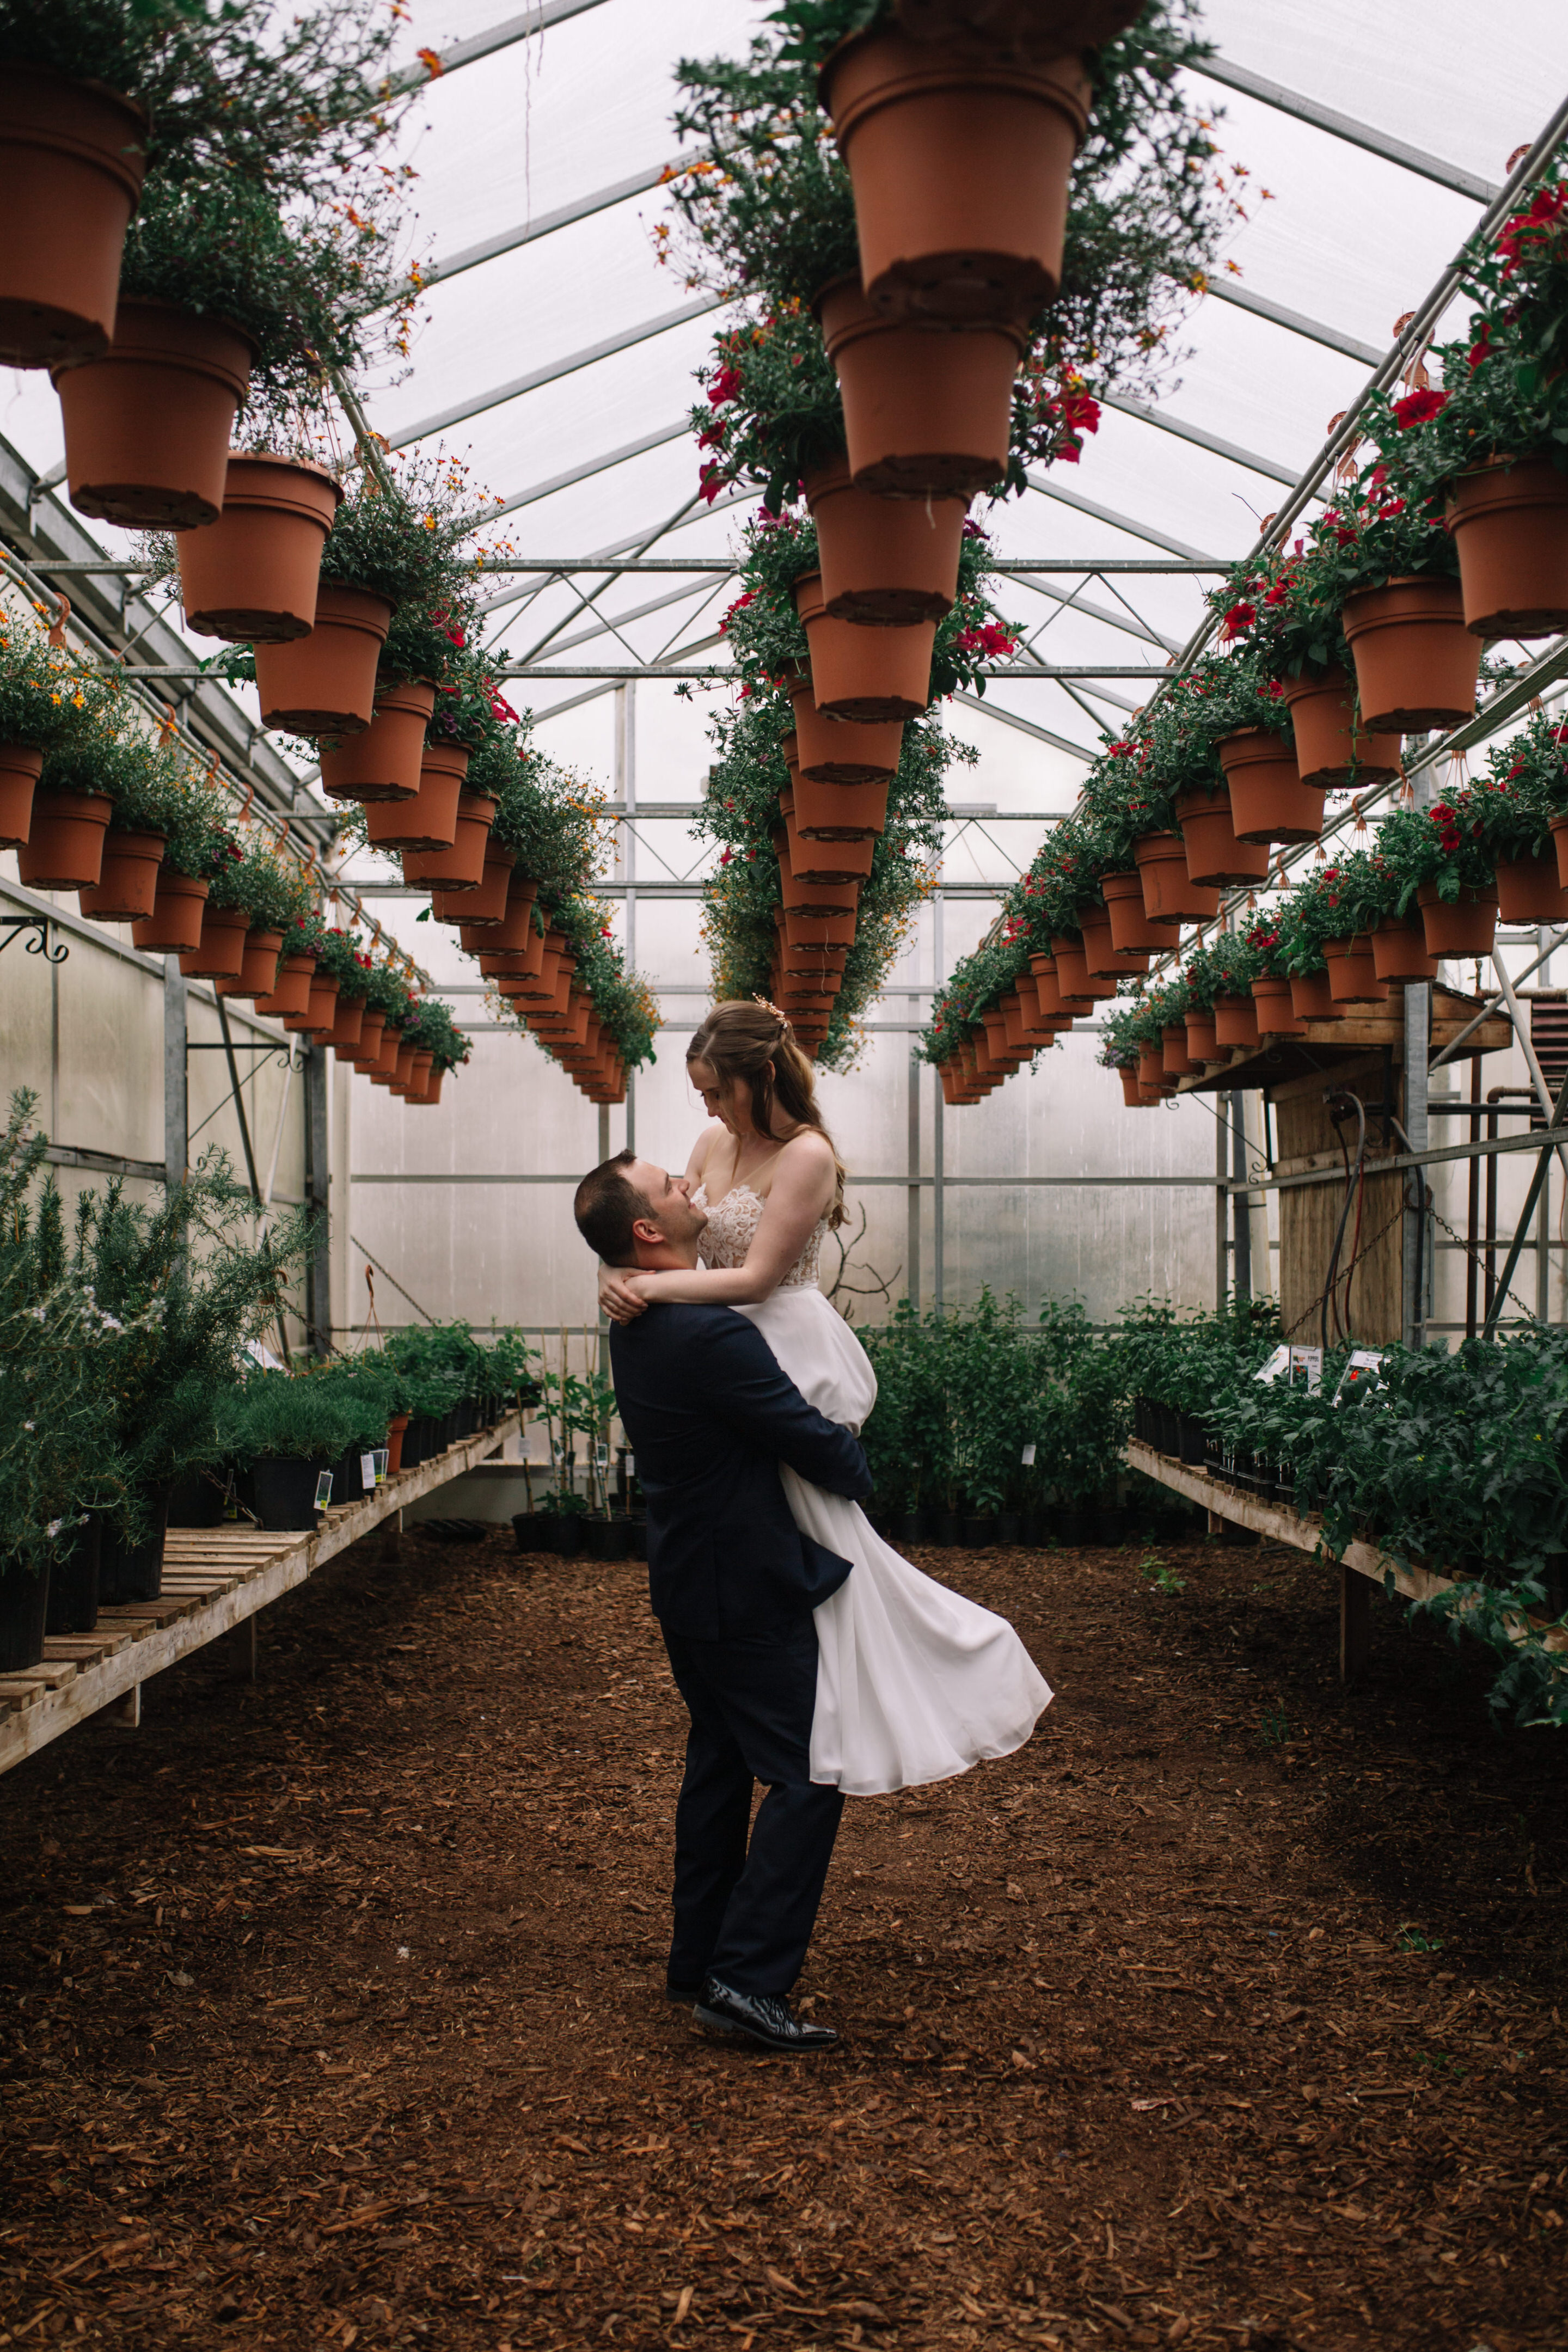 Best Calgary Photographers | Saskatoon Farm Wedding | Banff Wedding Photography | Canmore Wedding Photography | Intimate Weddings | Calgary Elopement | Anita Jeanine Photography | Greenhouse Wedding | Barn Wedding | Outdoor Wedding